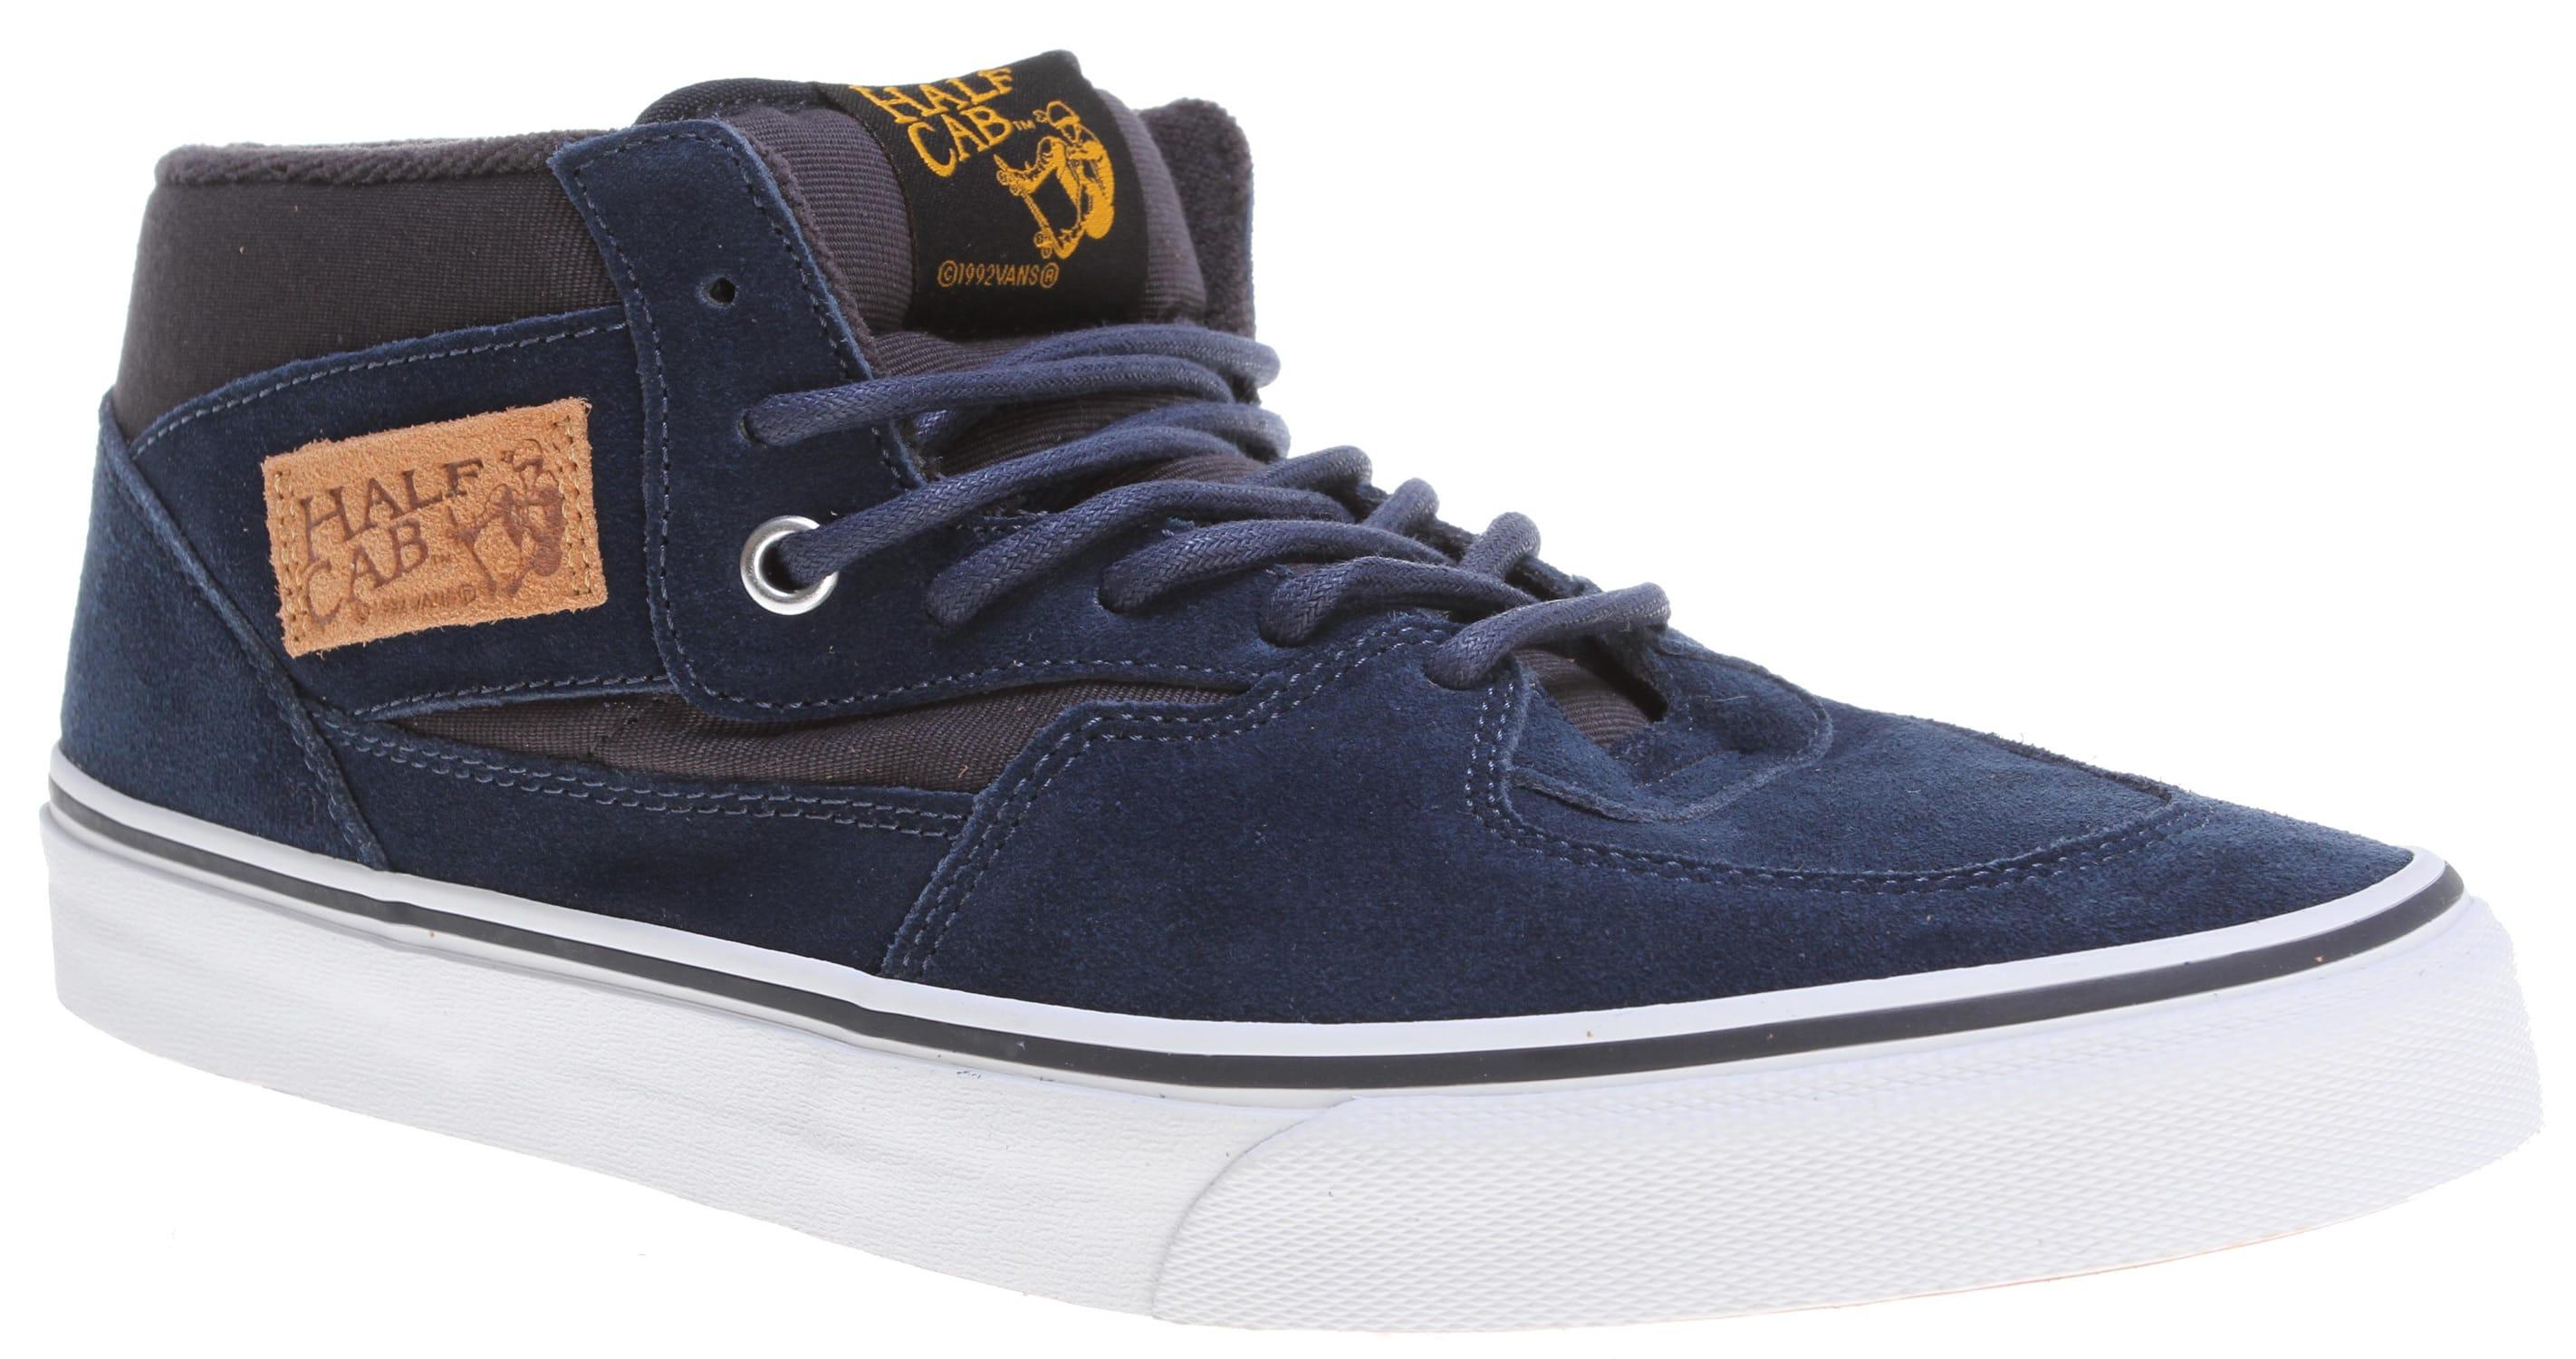 ec3d641ecd Vans Half Cab Skate Shoes - thumbnail 2